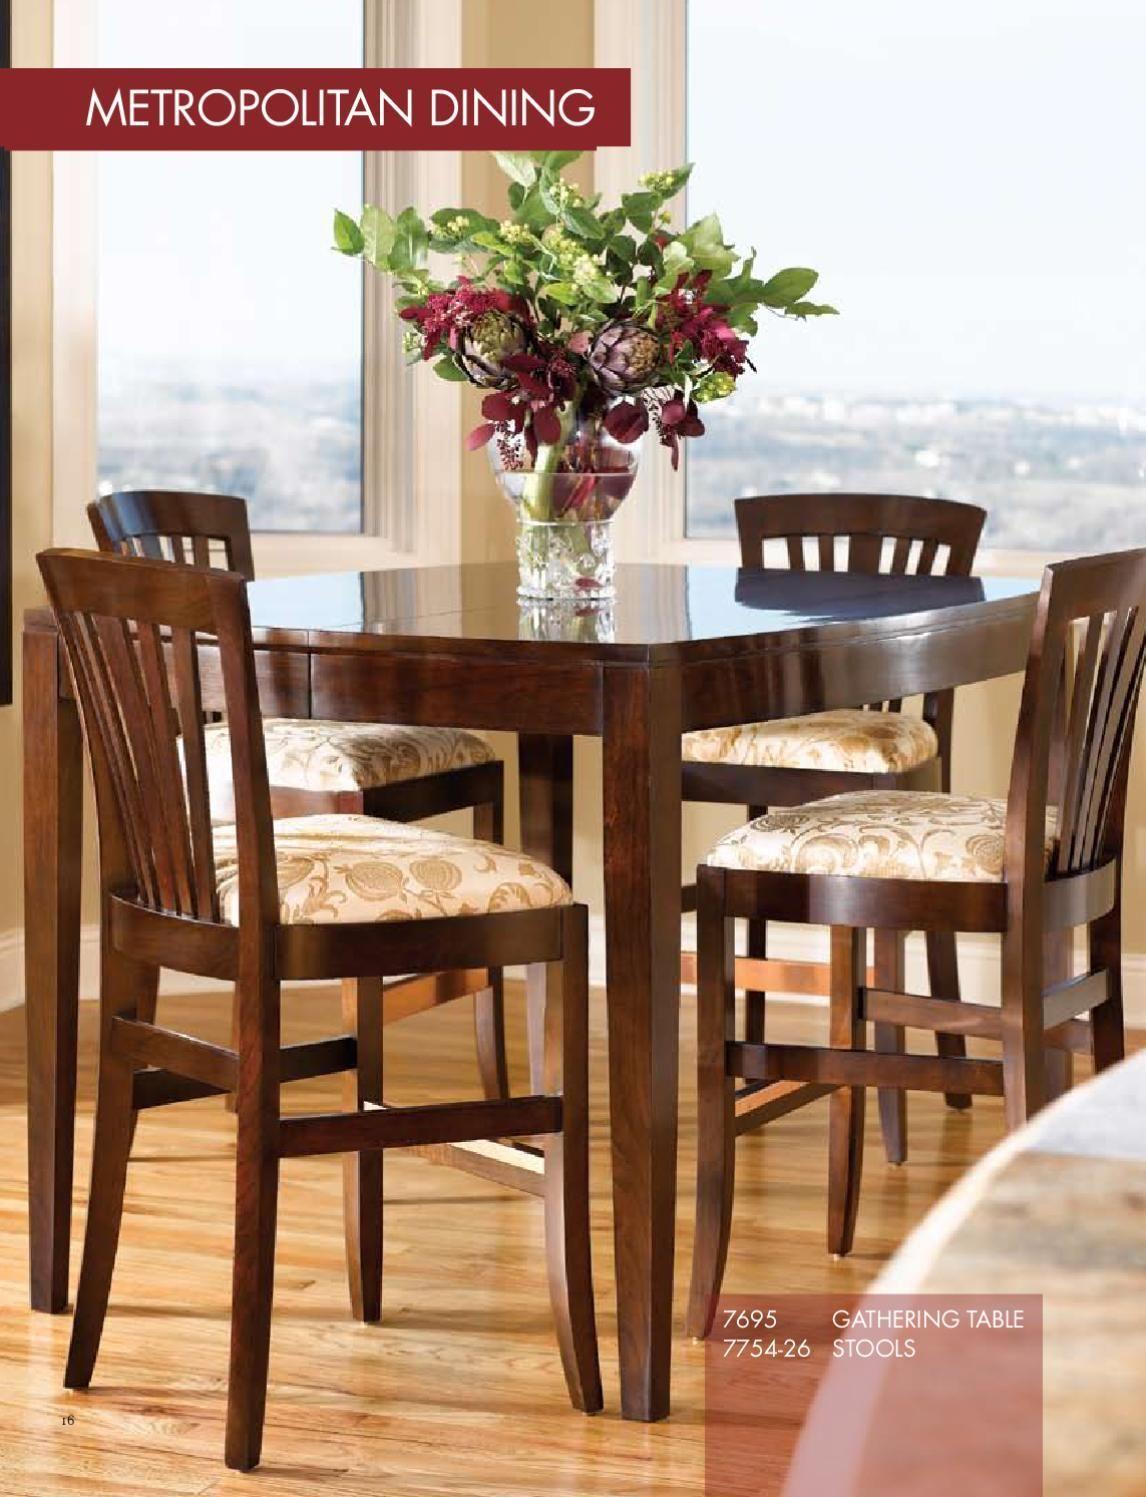 Sensational Stickley Metropolitan Collection Dining Room Furniture Alphanode Cool Chair Designs And Ideas Alphanodeonline